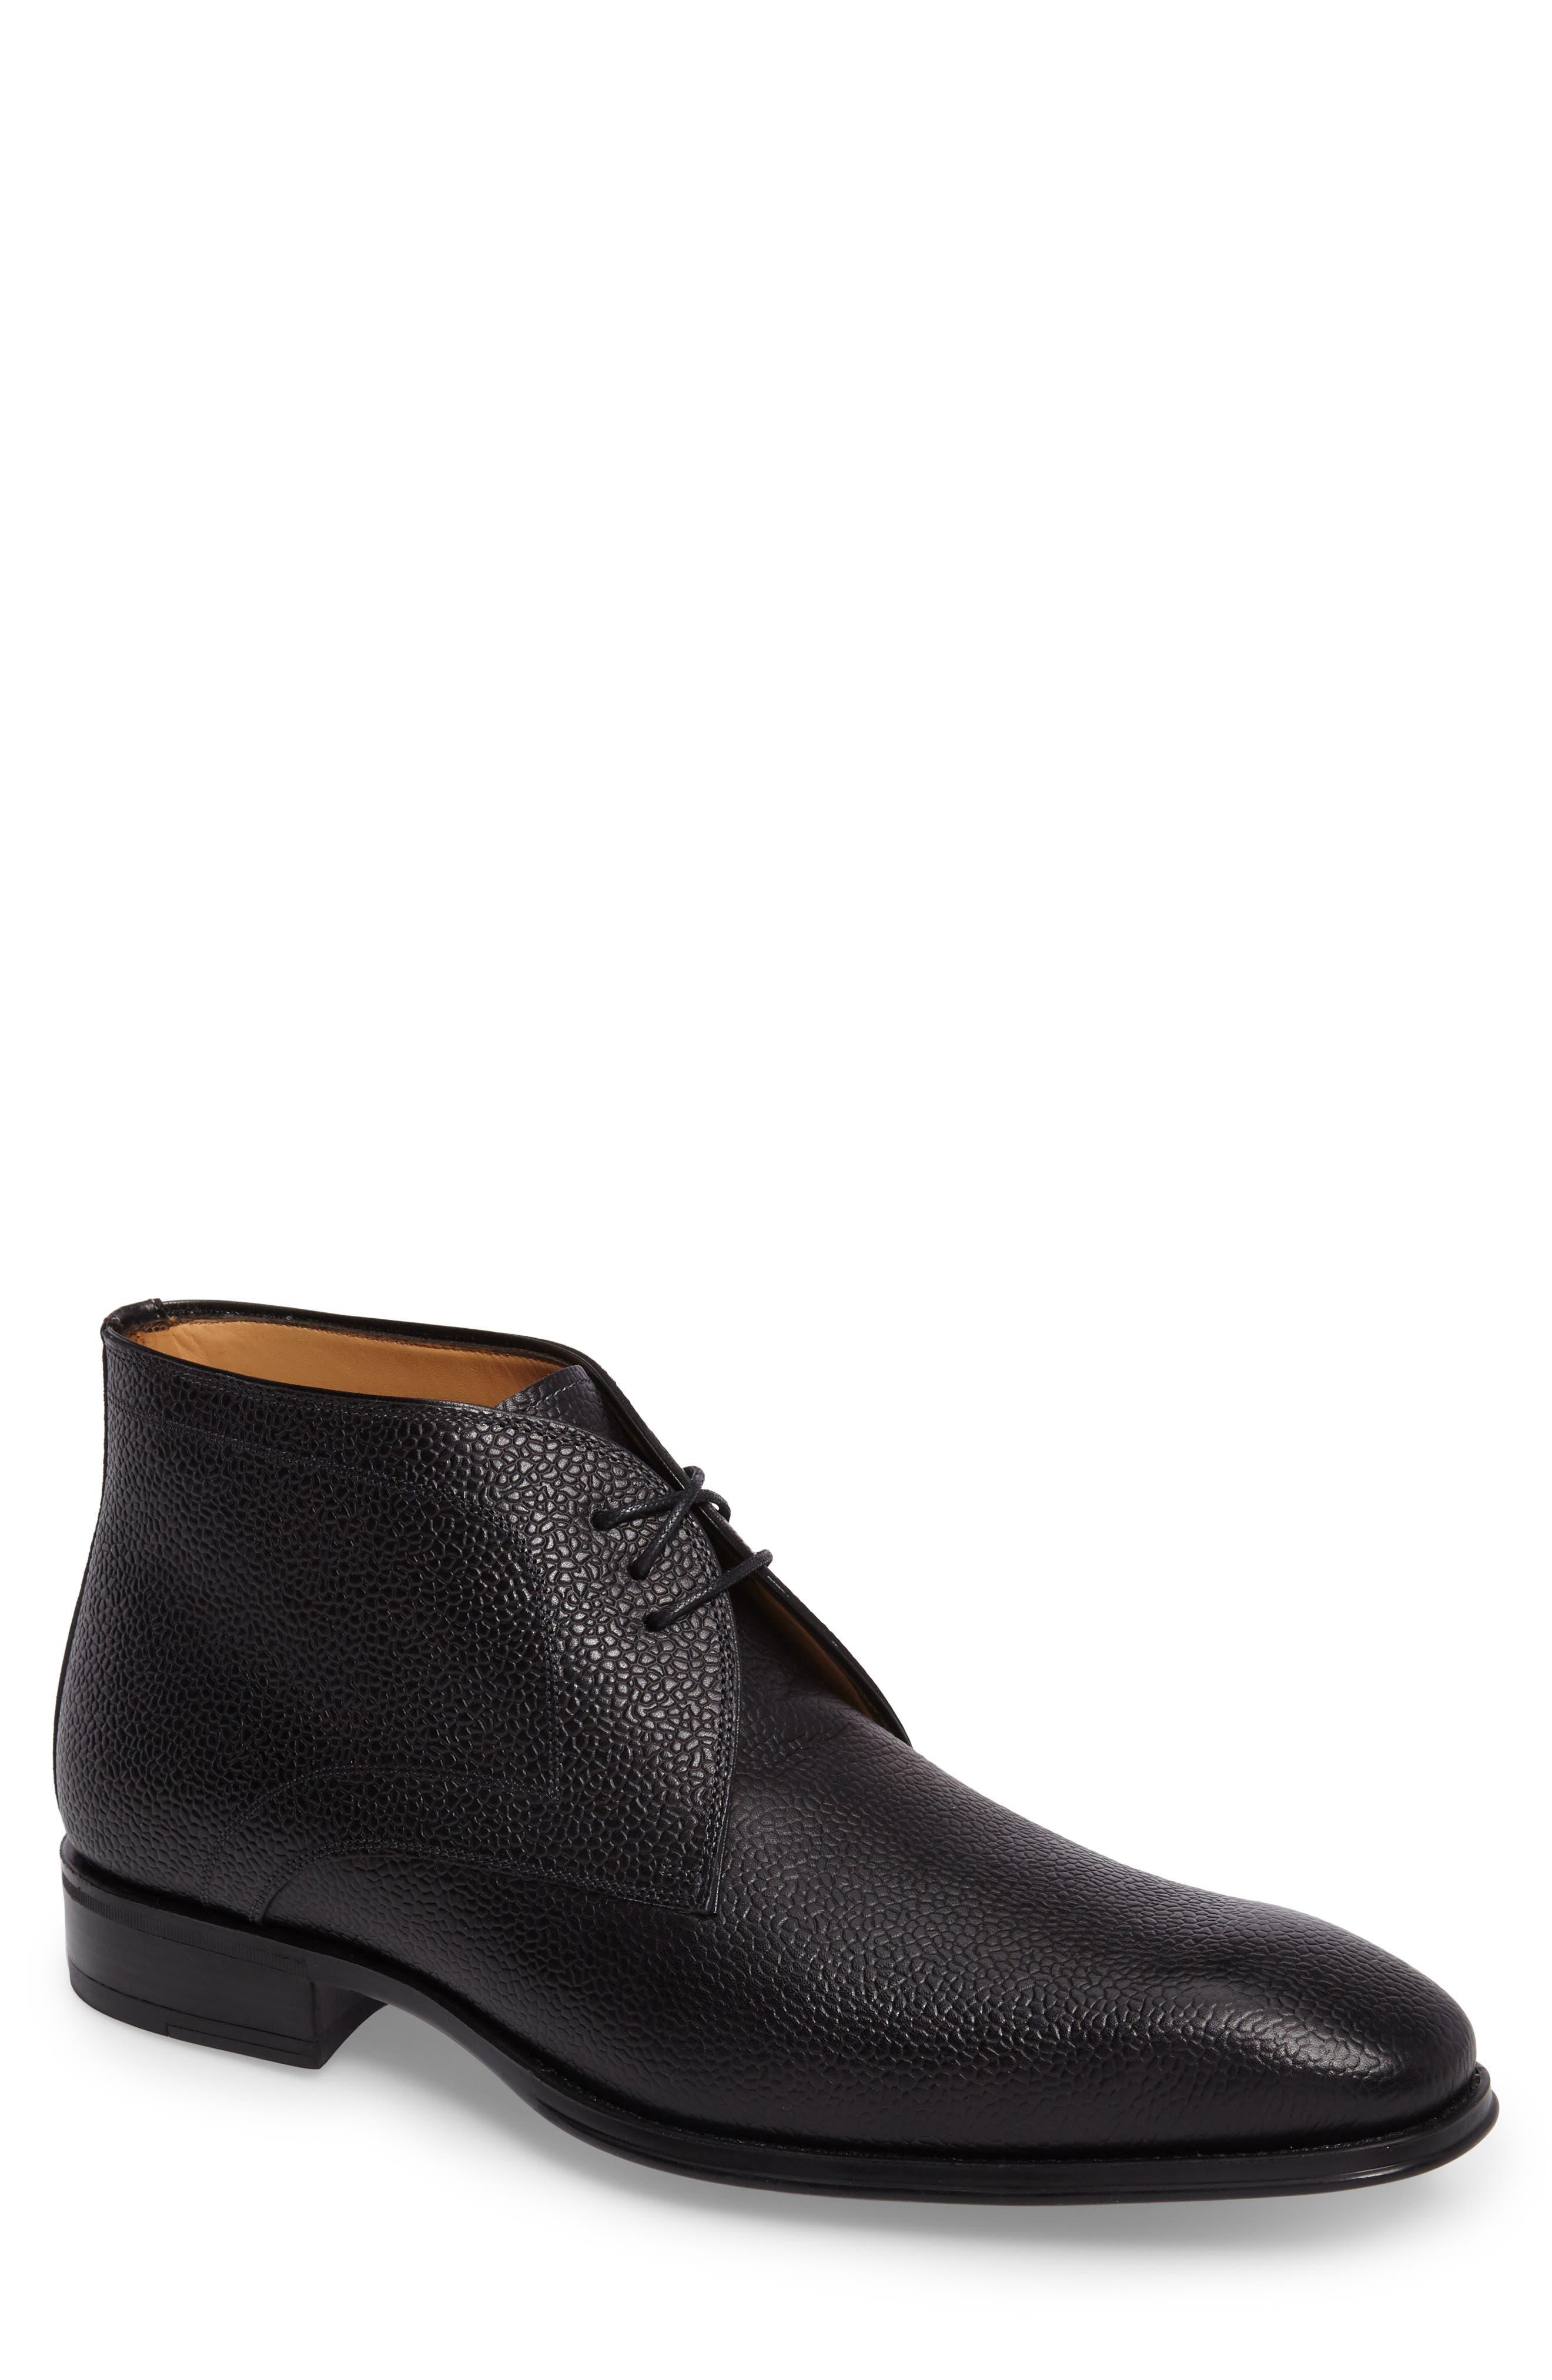 Cabra Plain Toe Derby,                         Main,                         color, BLACK LEATHER